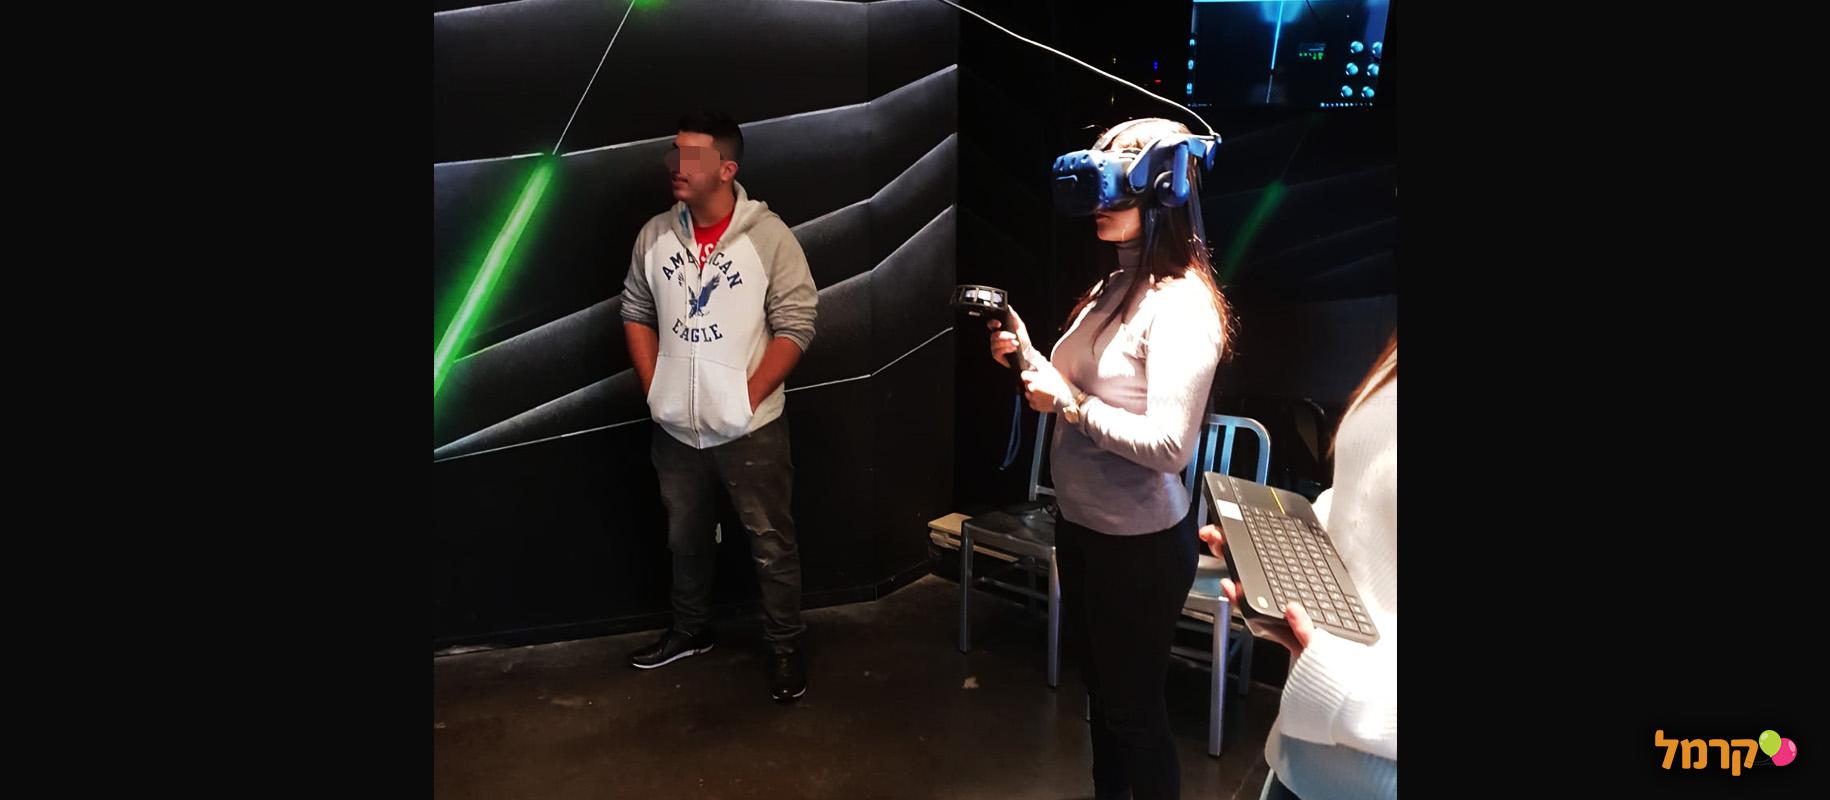 Sesom VR - מציאות מדומה - 073-7840262